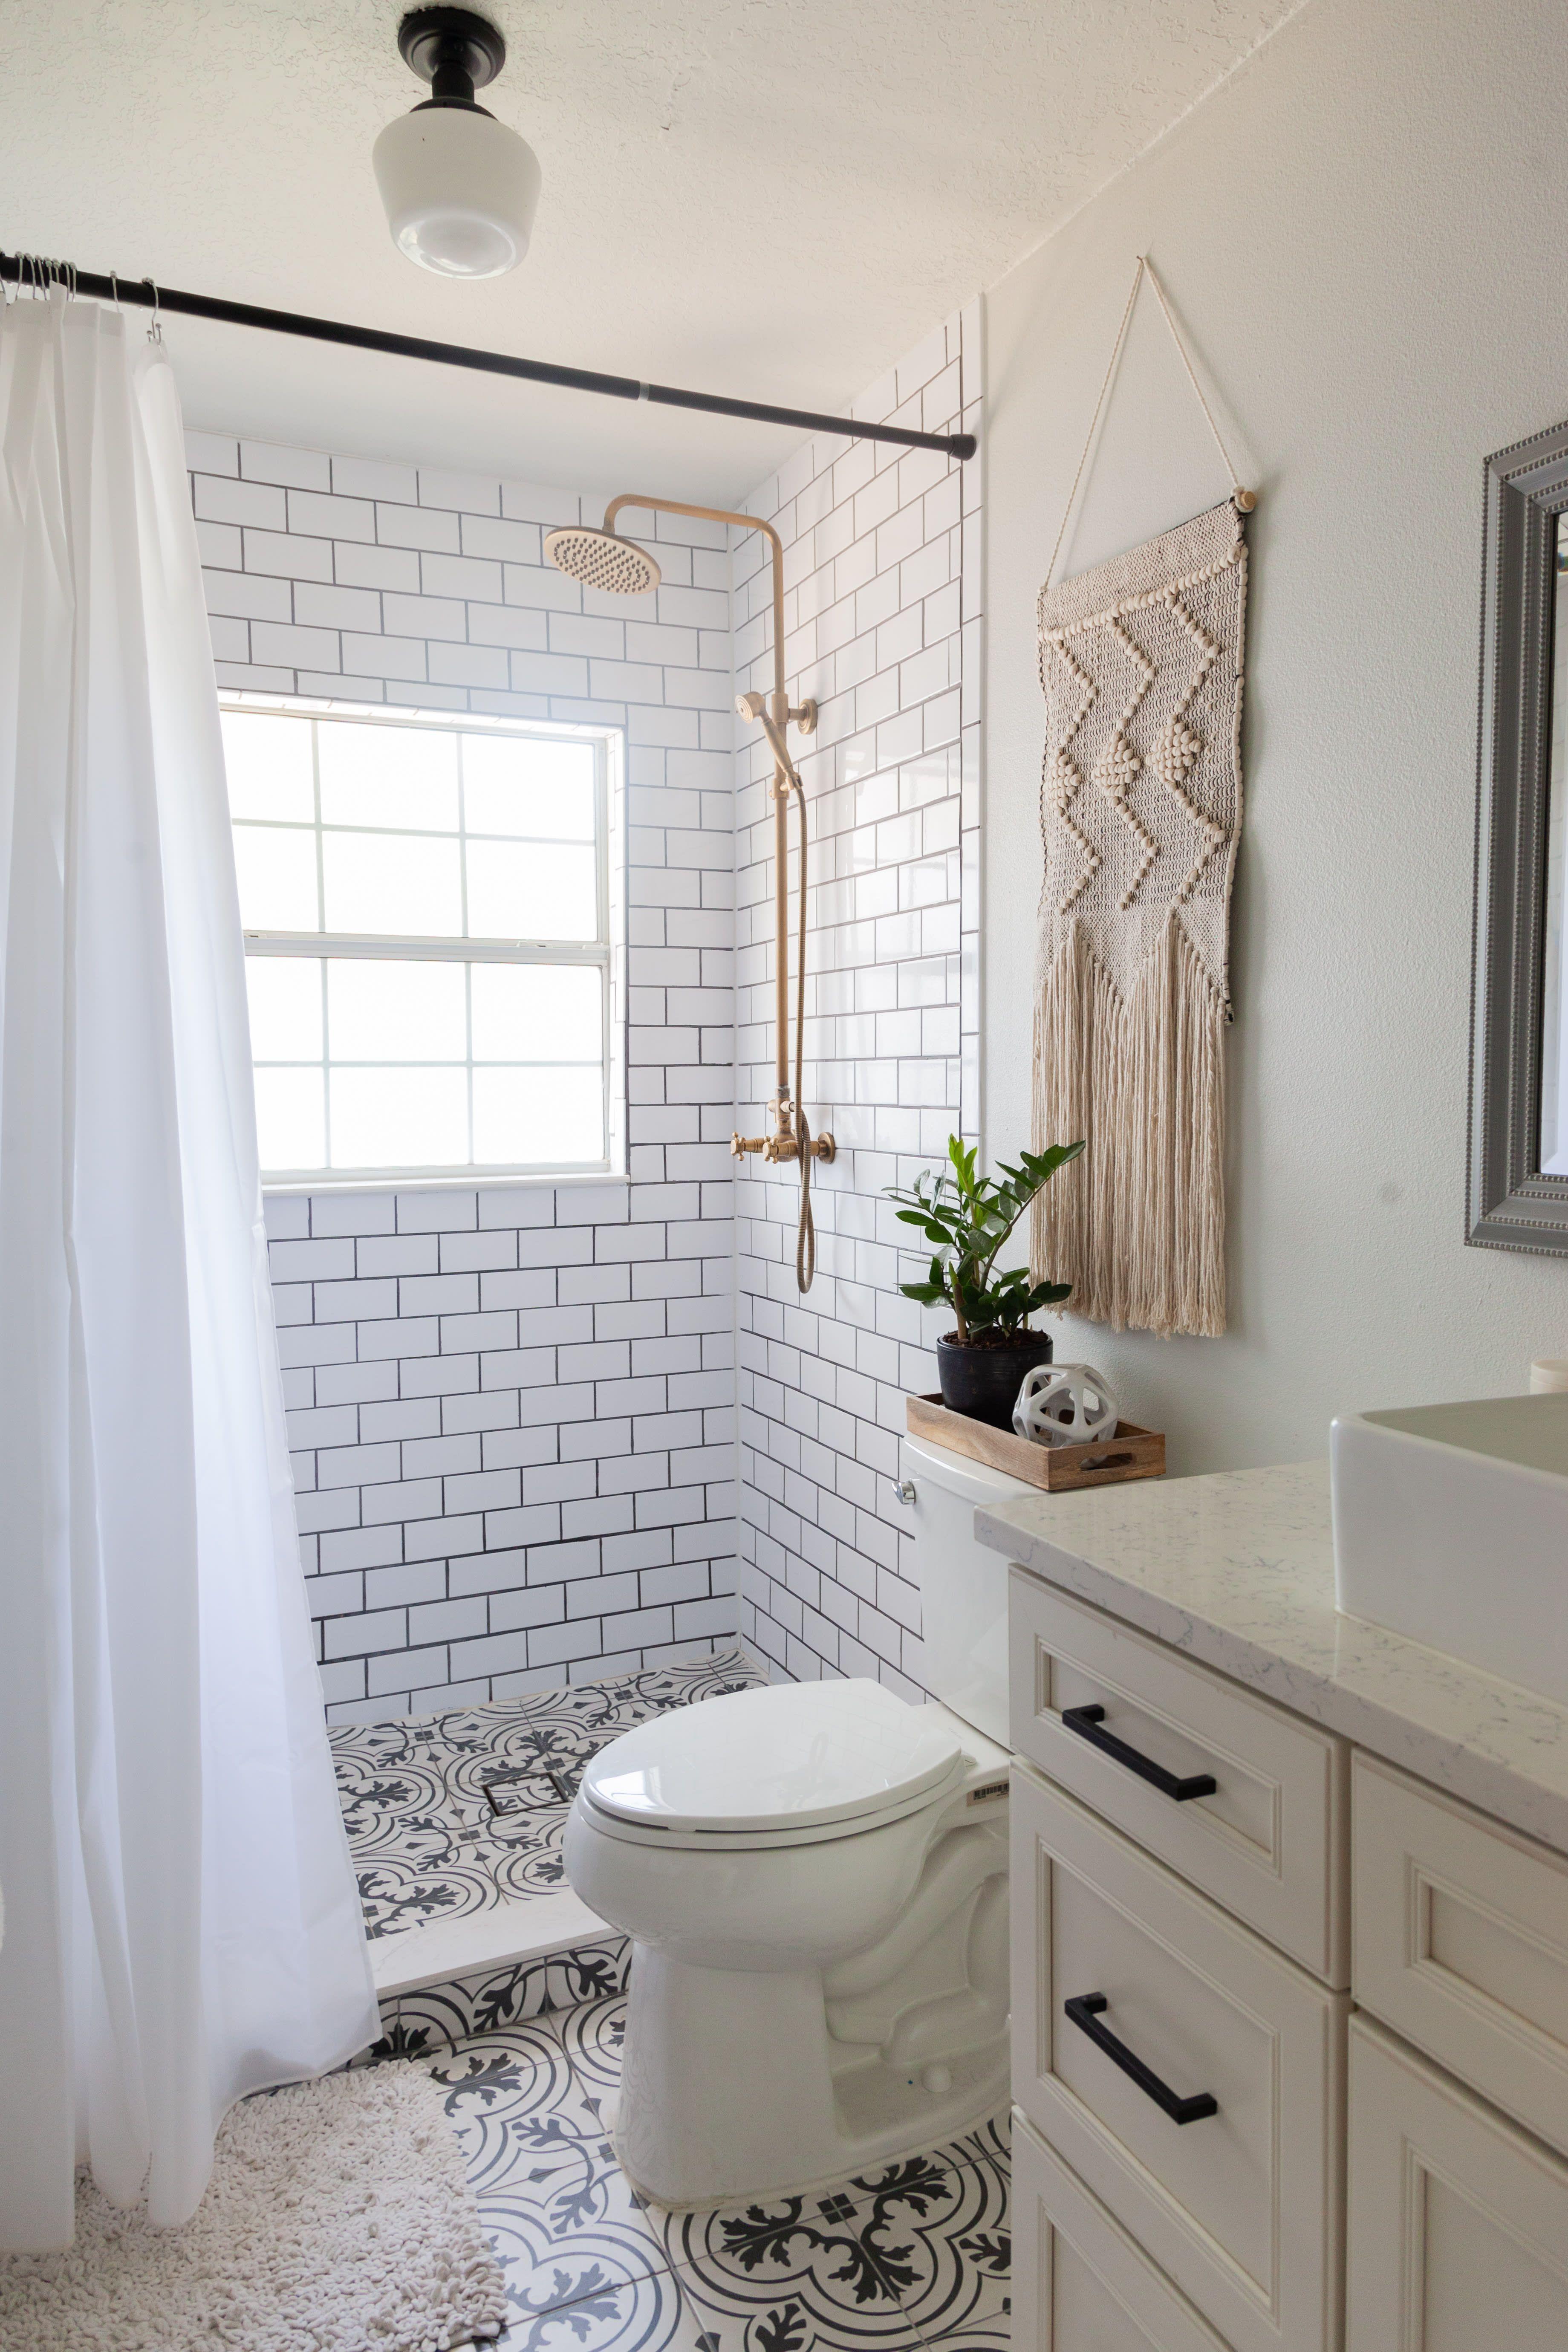 47 inspiring bathroom remodel ideas you must try on bathroom renovation ideas id=31178